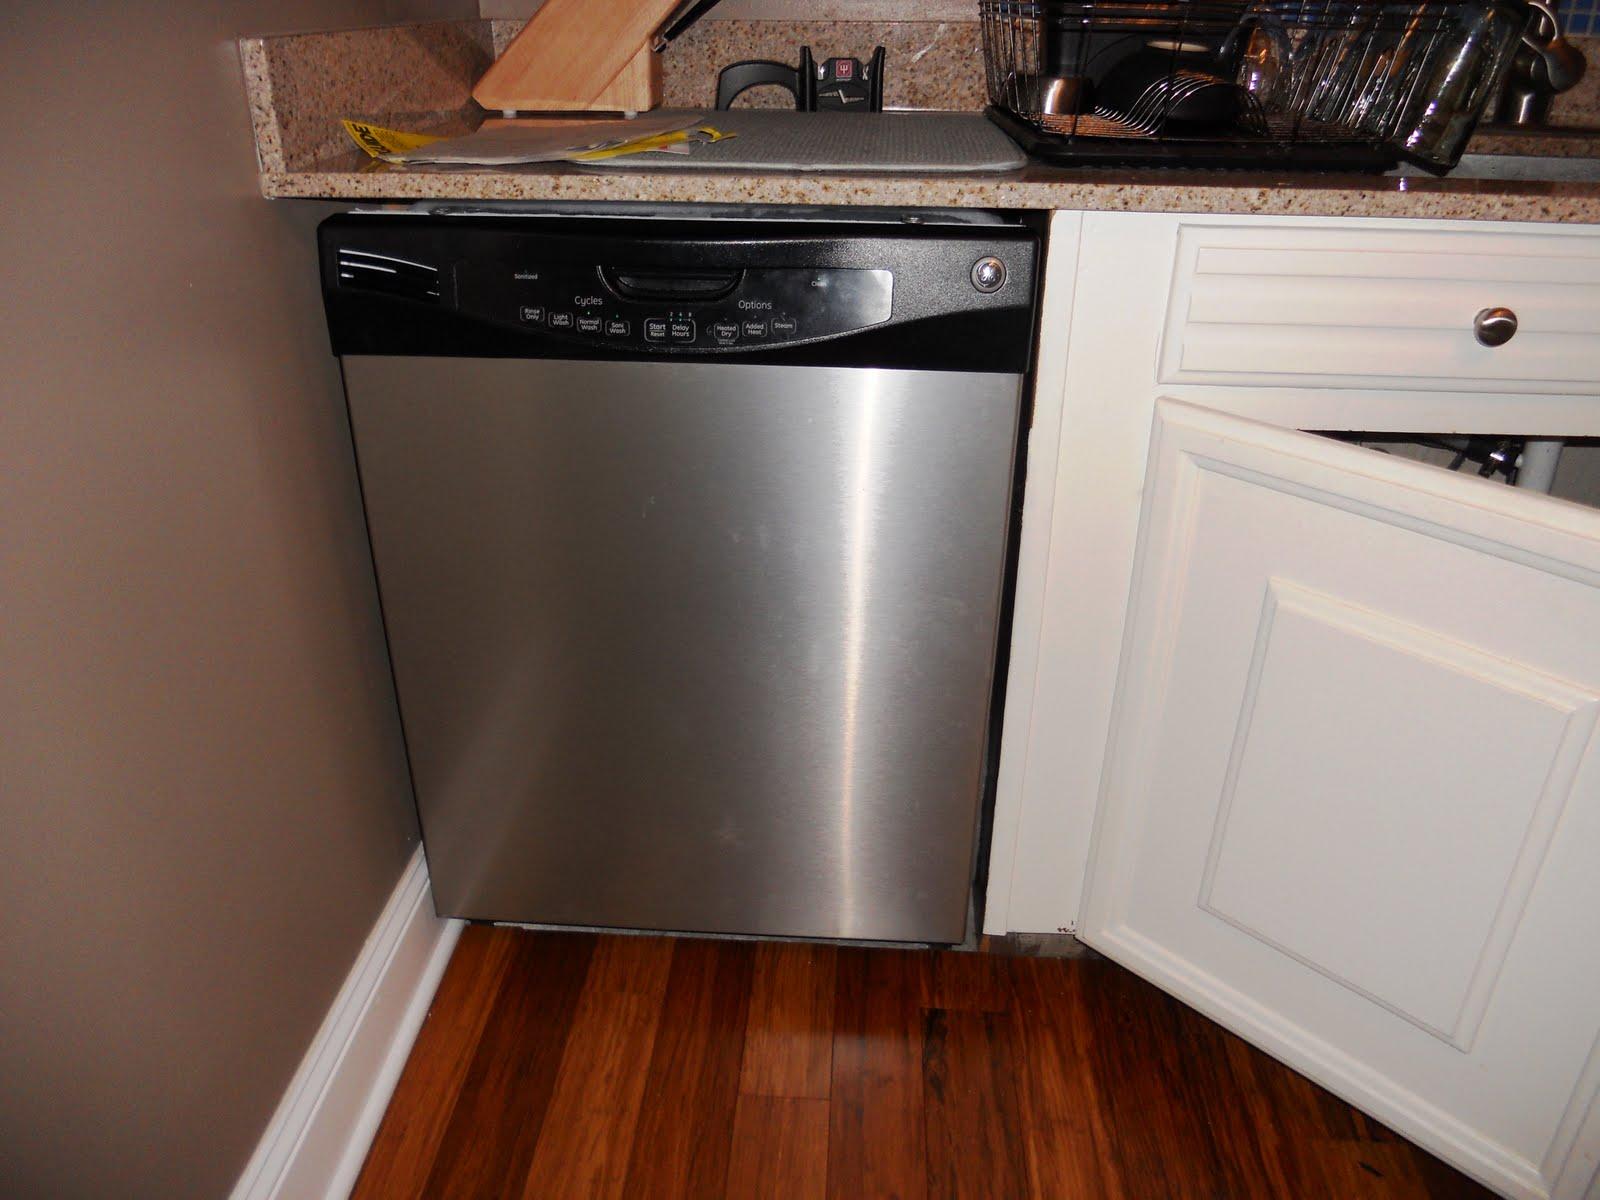 Sink Top Dishwashers Images